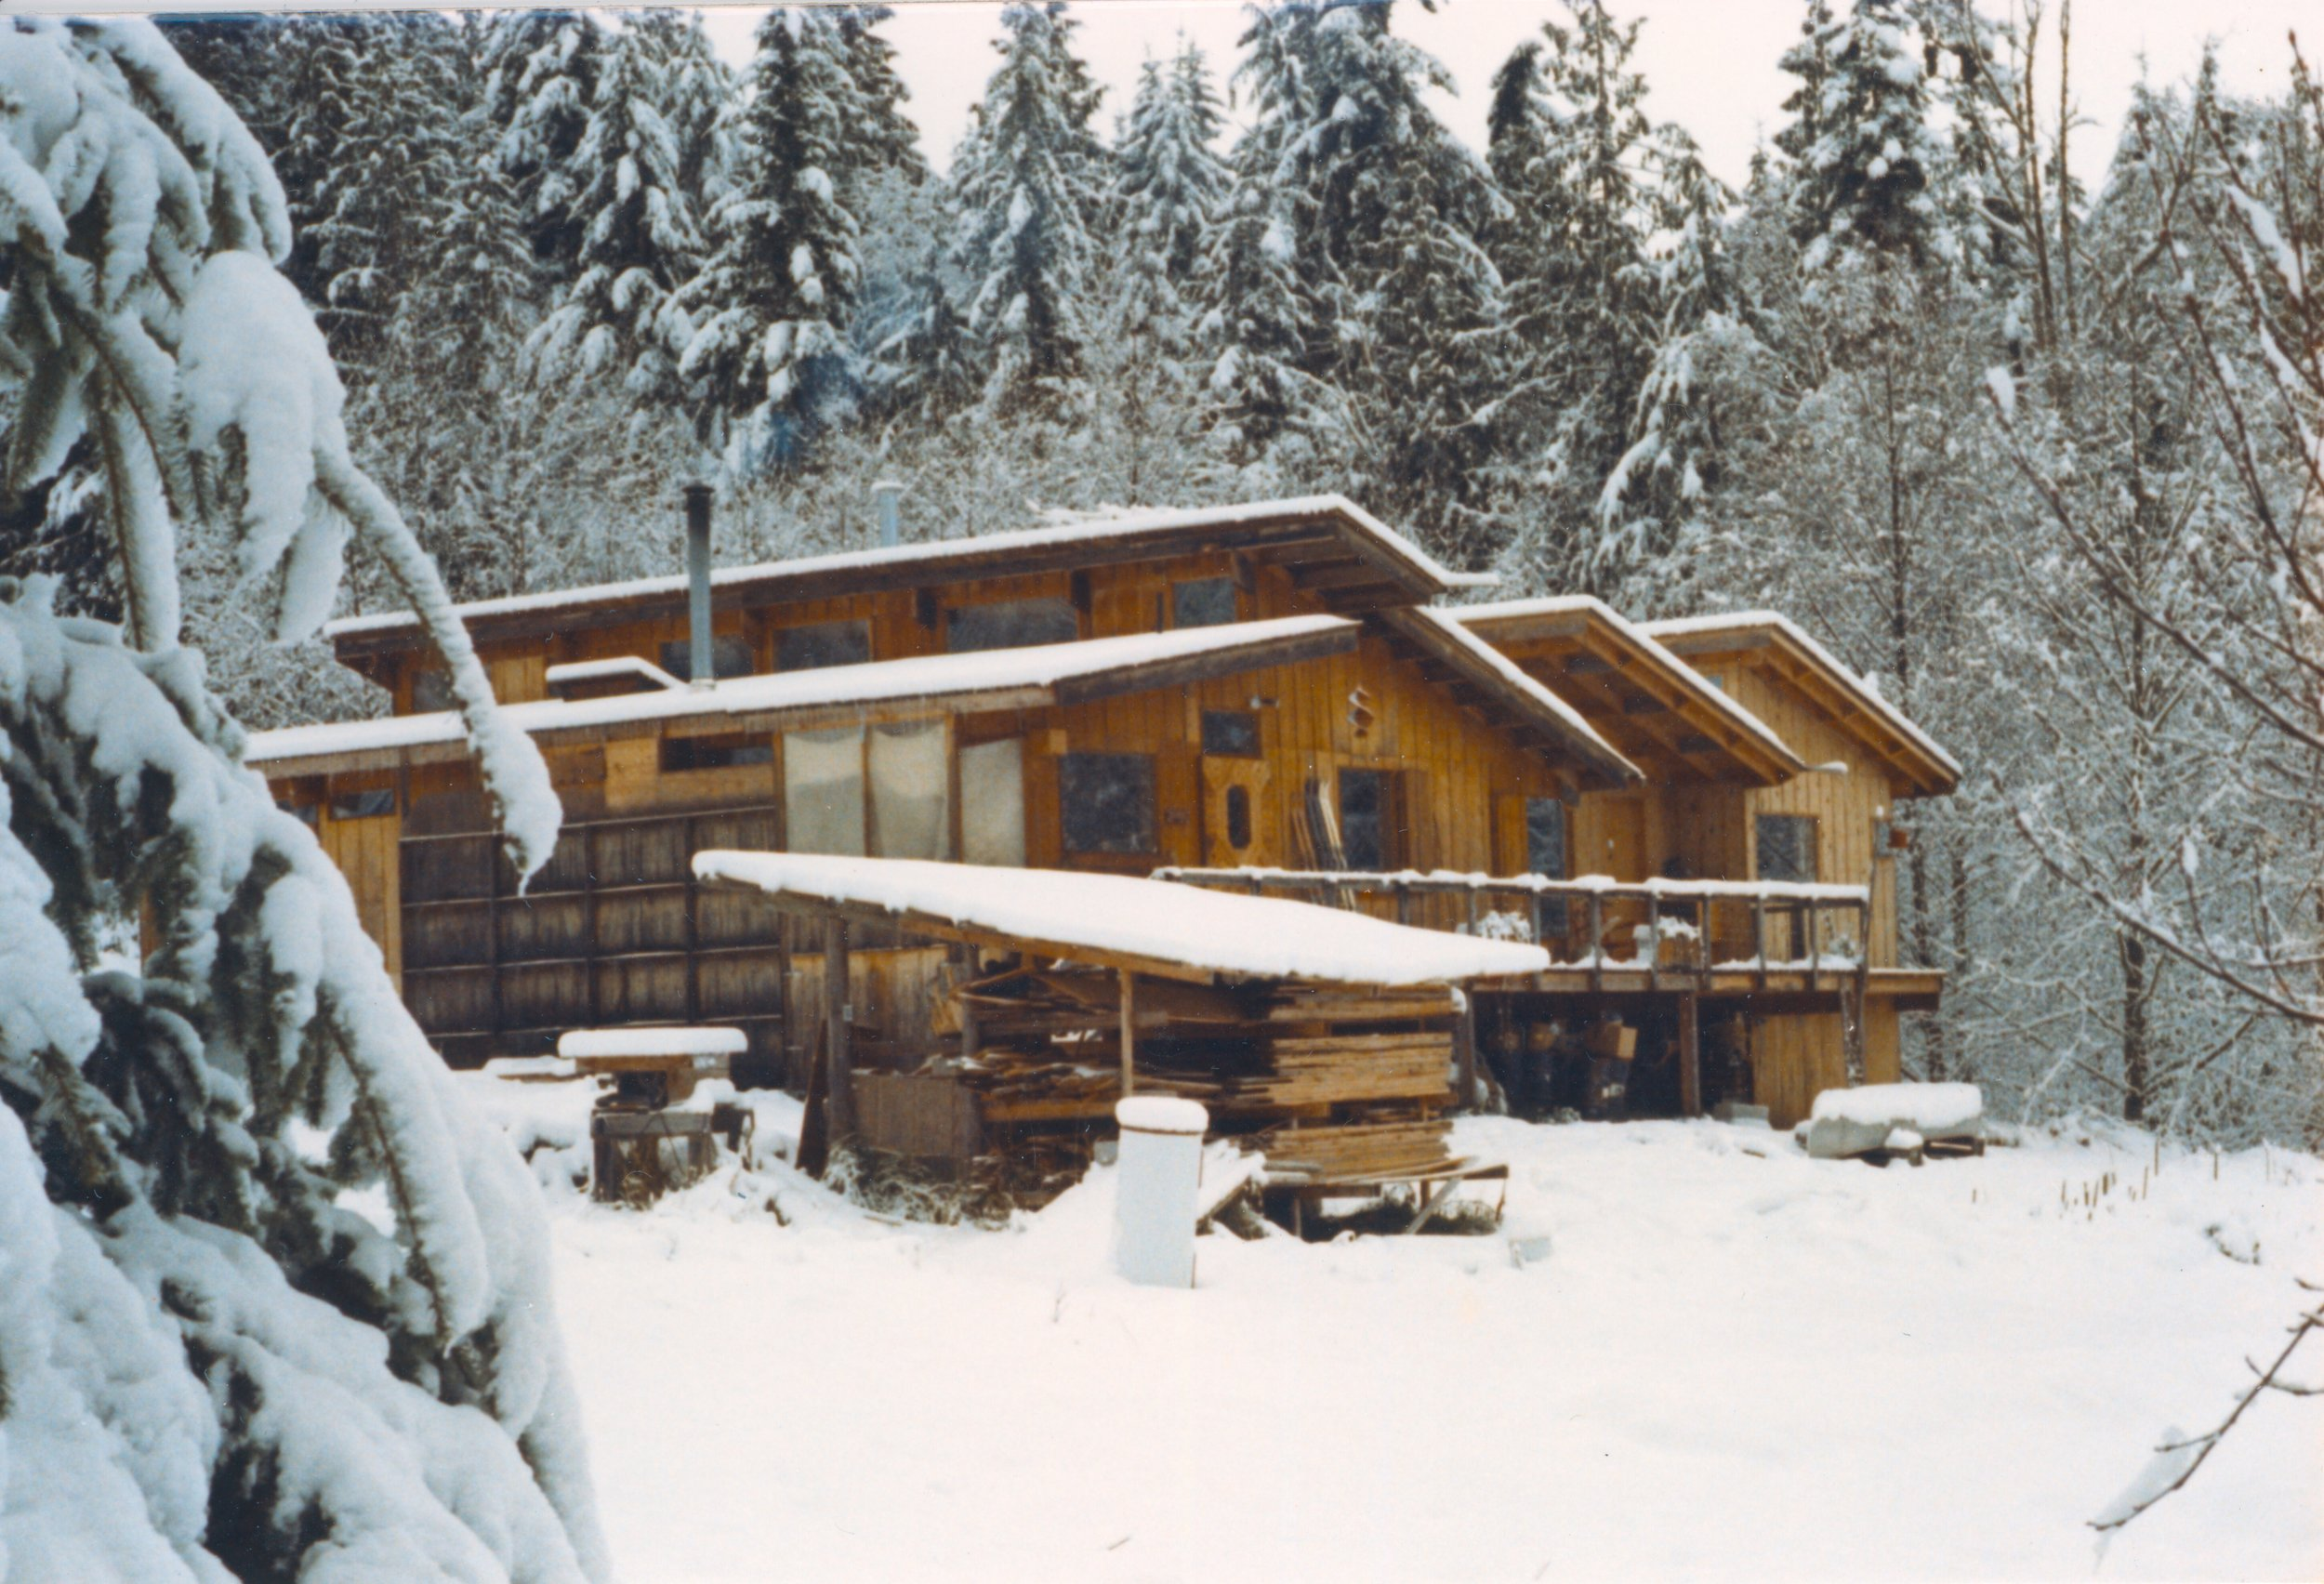 Robert's custom, sustainable, hand-built house in Sequim, WA